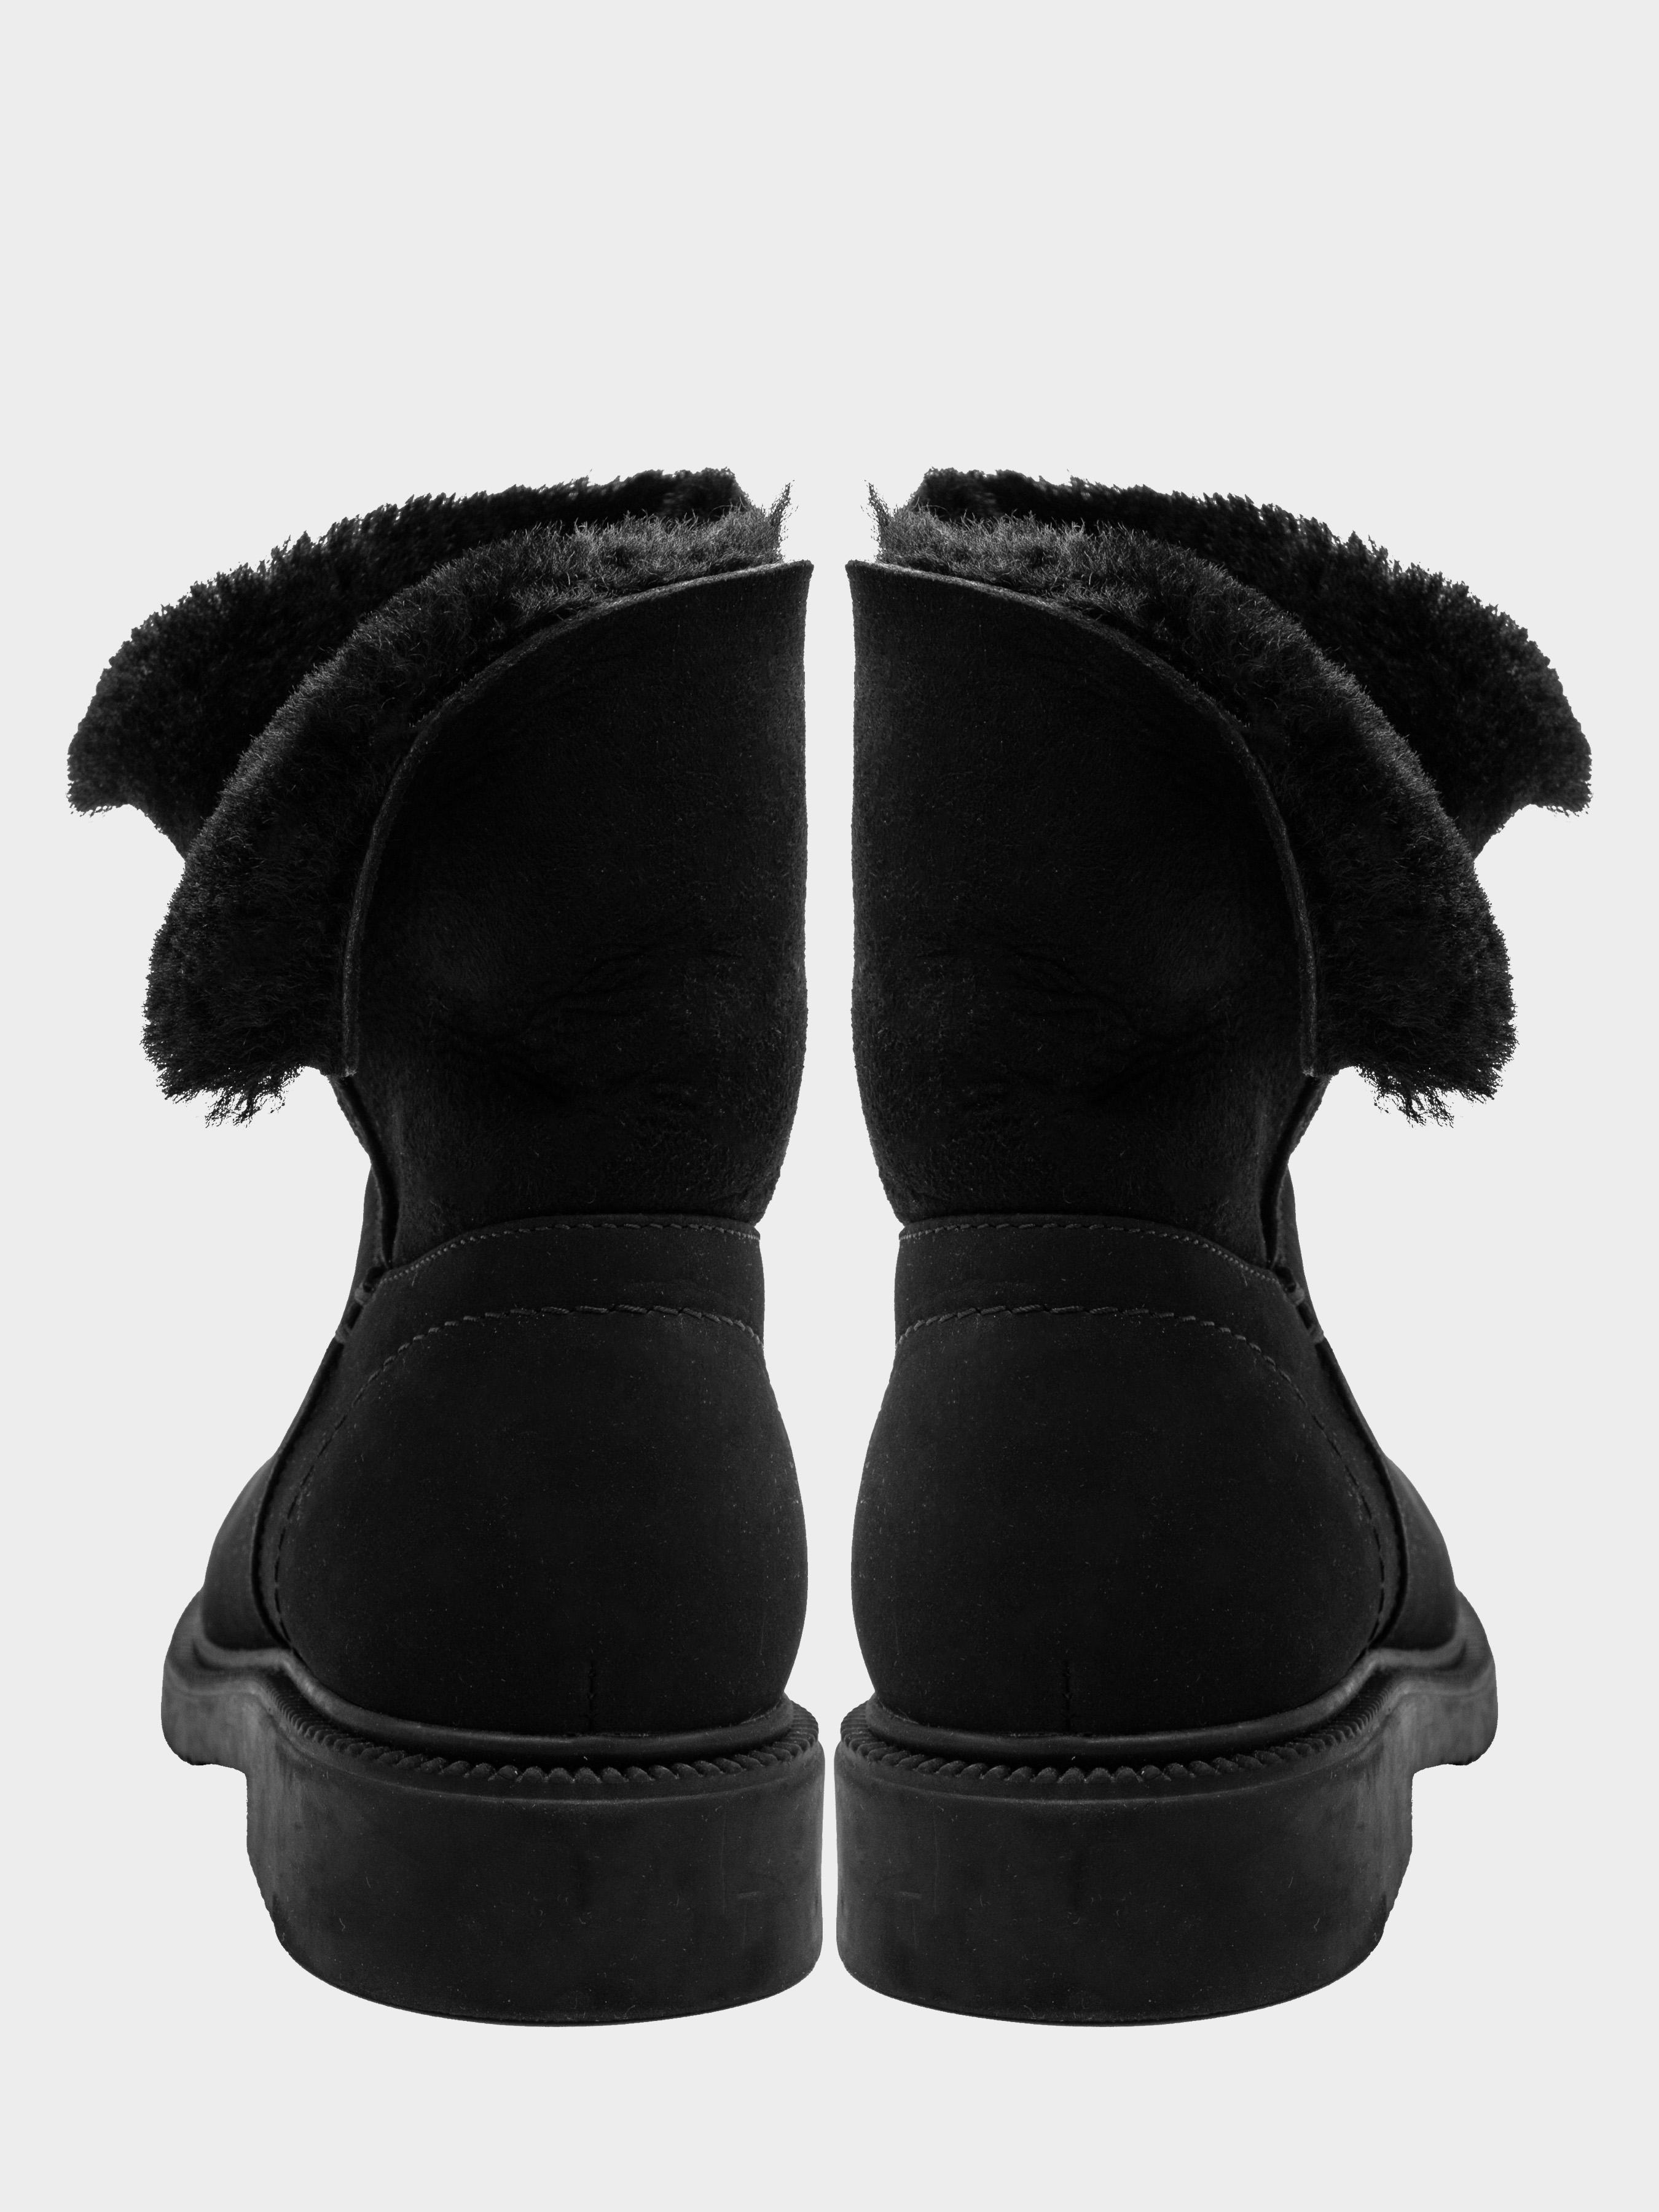 Ботинки для женщин Ботинки женские ENZO VERRATTI 18-3264-10w примерка, 2017